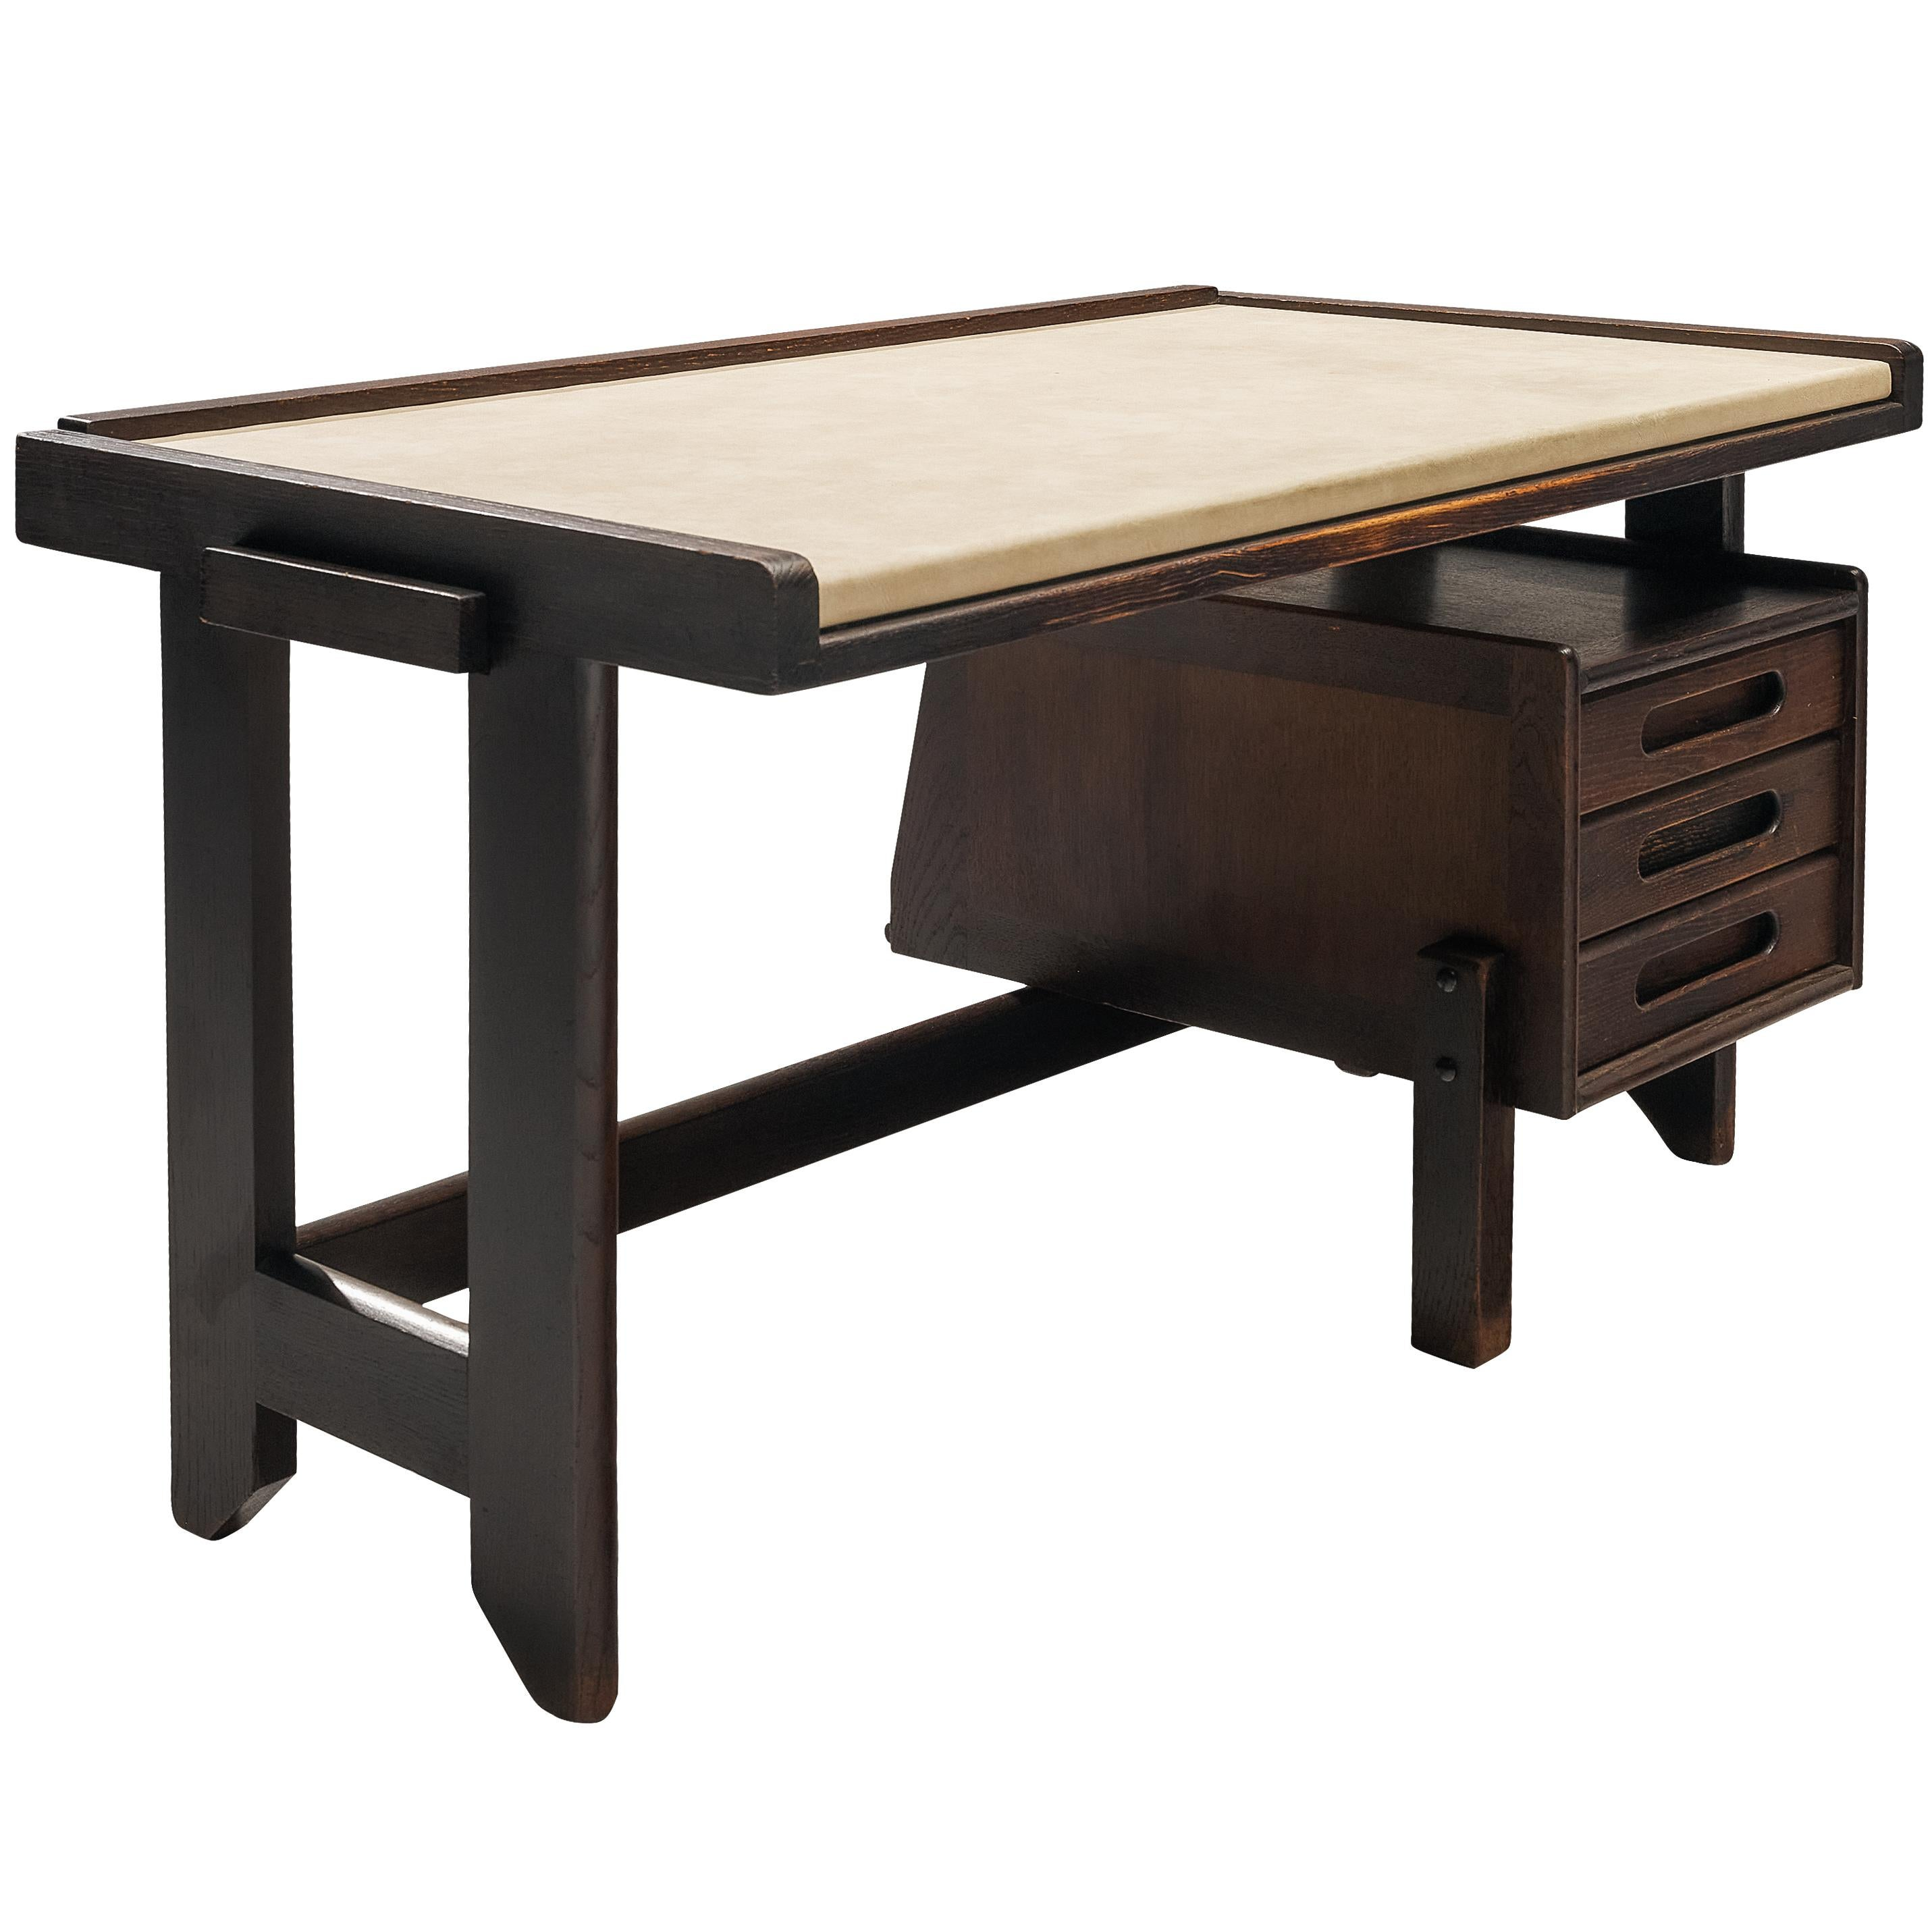 Guillerme & Chambron Desk in Stained Oak